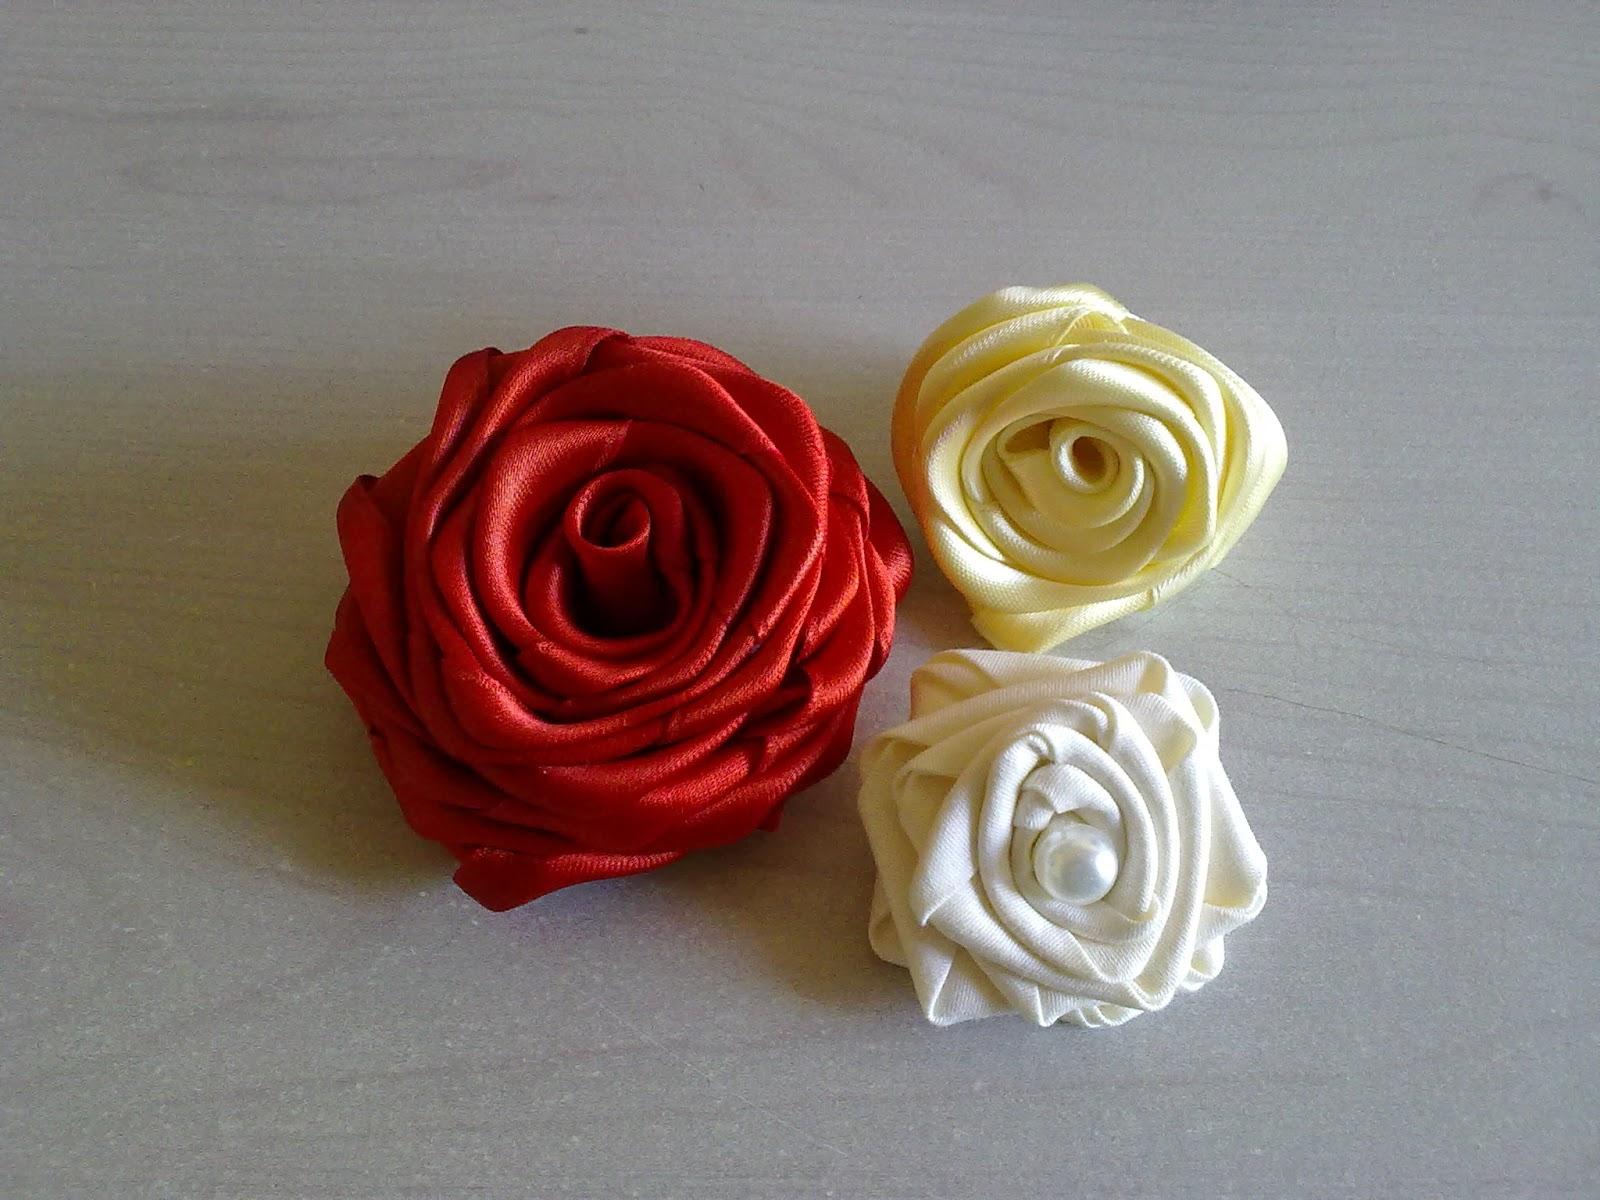 Eccezionale LaurArt - handmade Jewelry: Mille fiori..di carta di stoffa  OE63